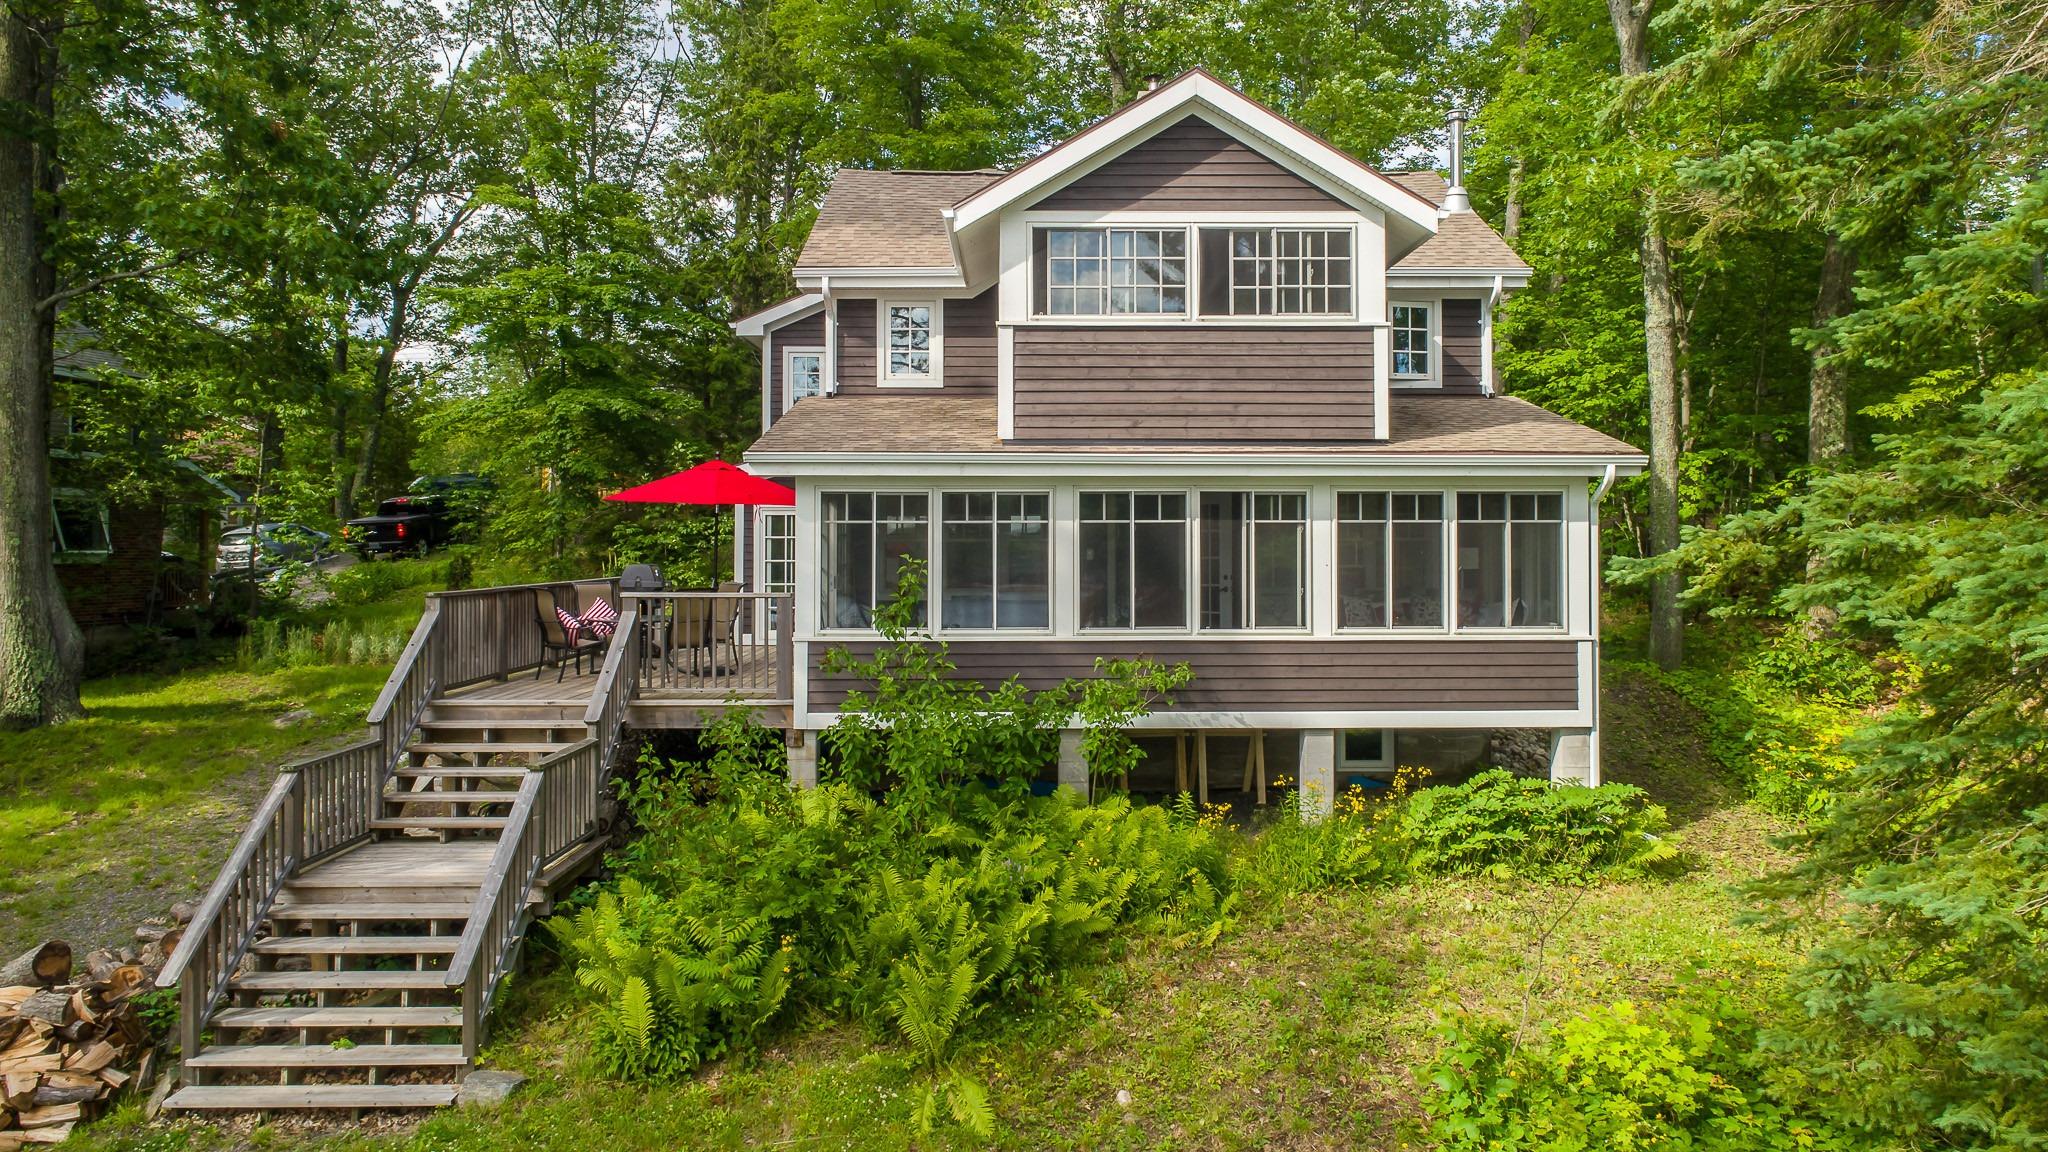 Best Muskoka cottage rentals to enjoy   Vrbo Canada